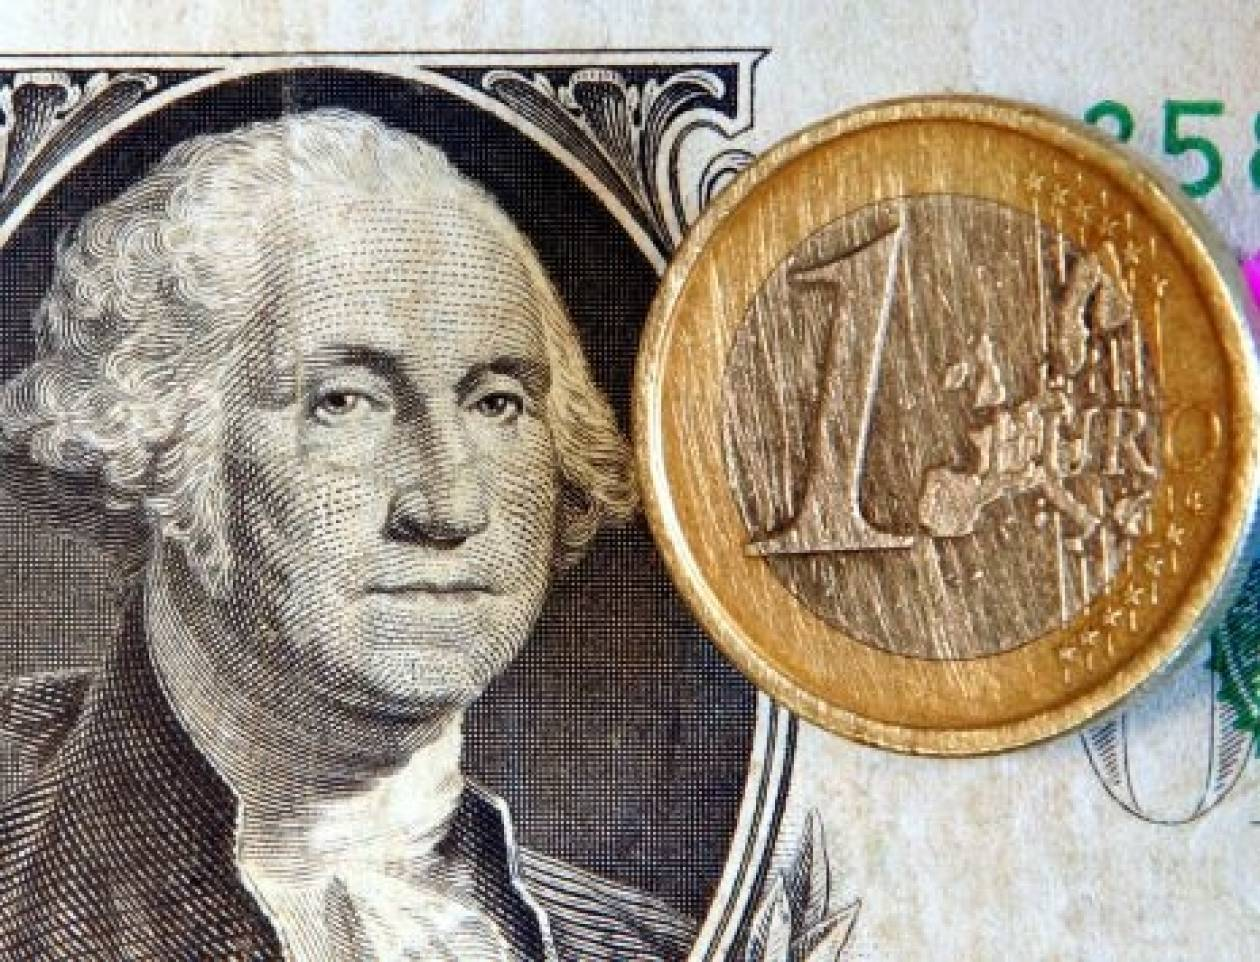 PwC: Ανησυχούν οι επιχειρηματίες για την παγκόσμια οικονομική αστάθεια